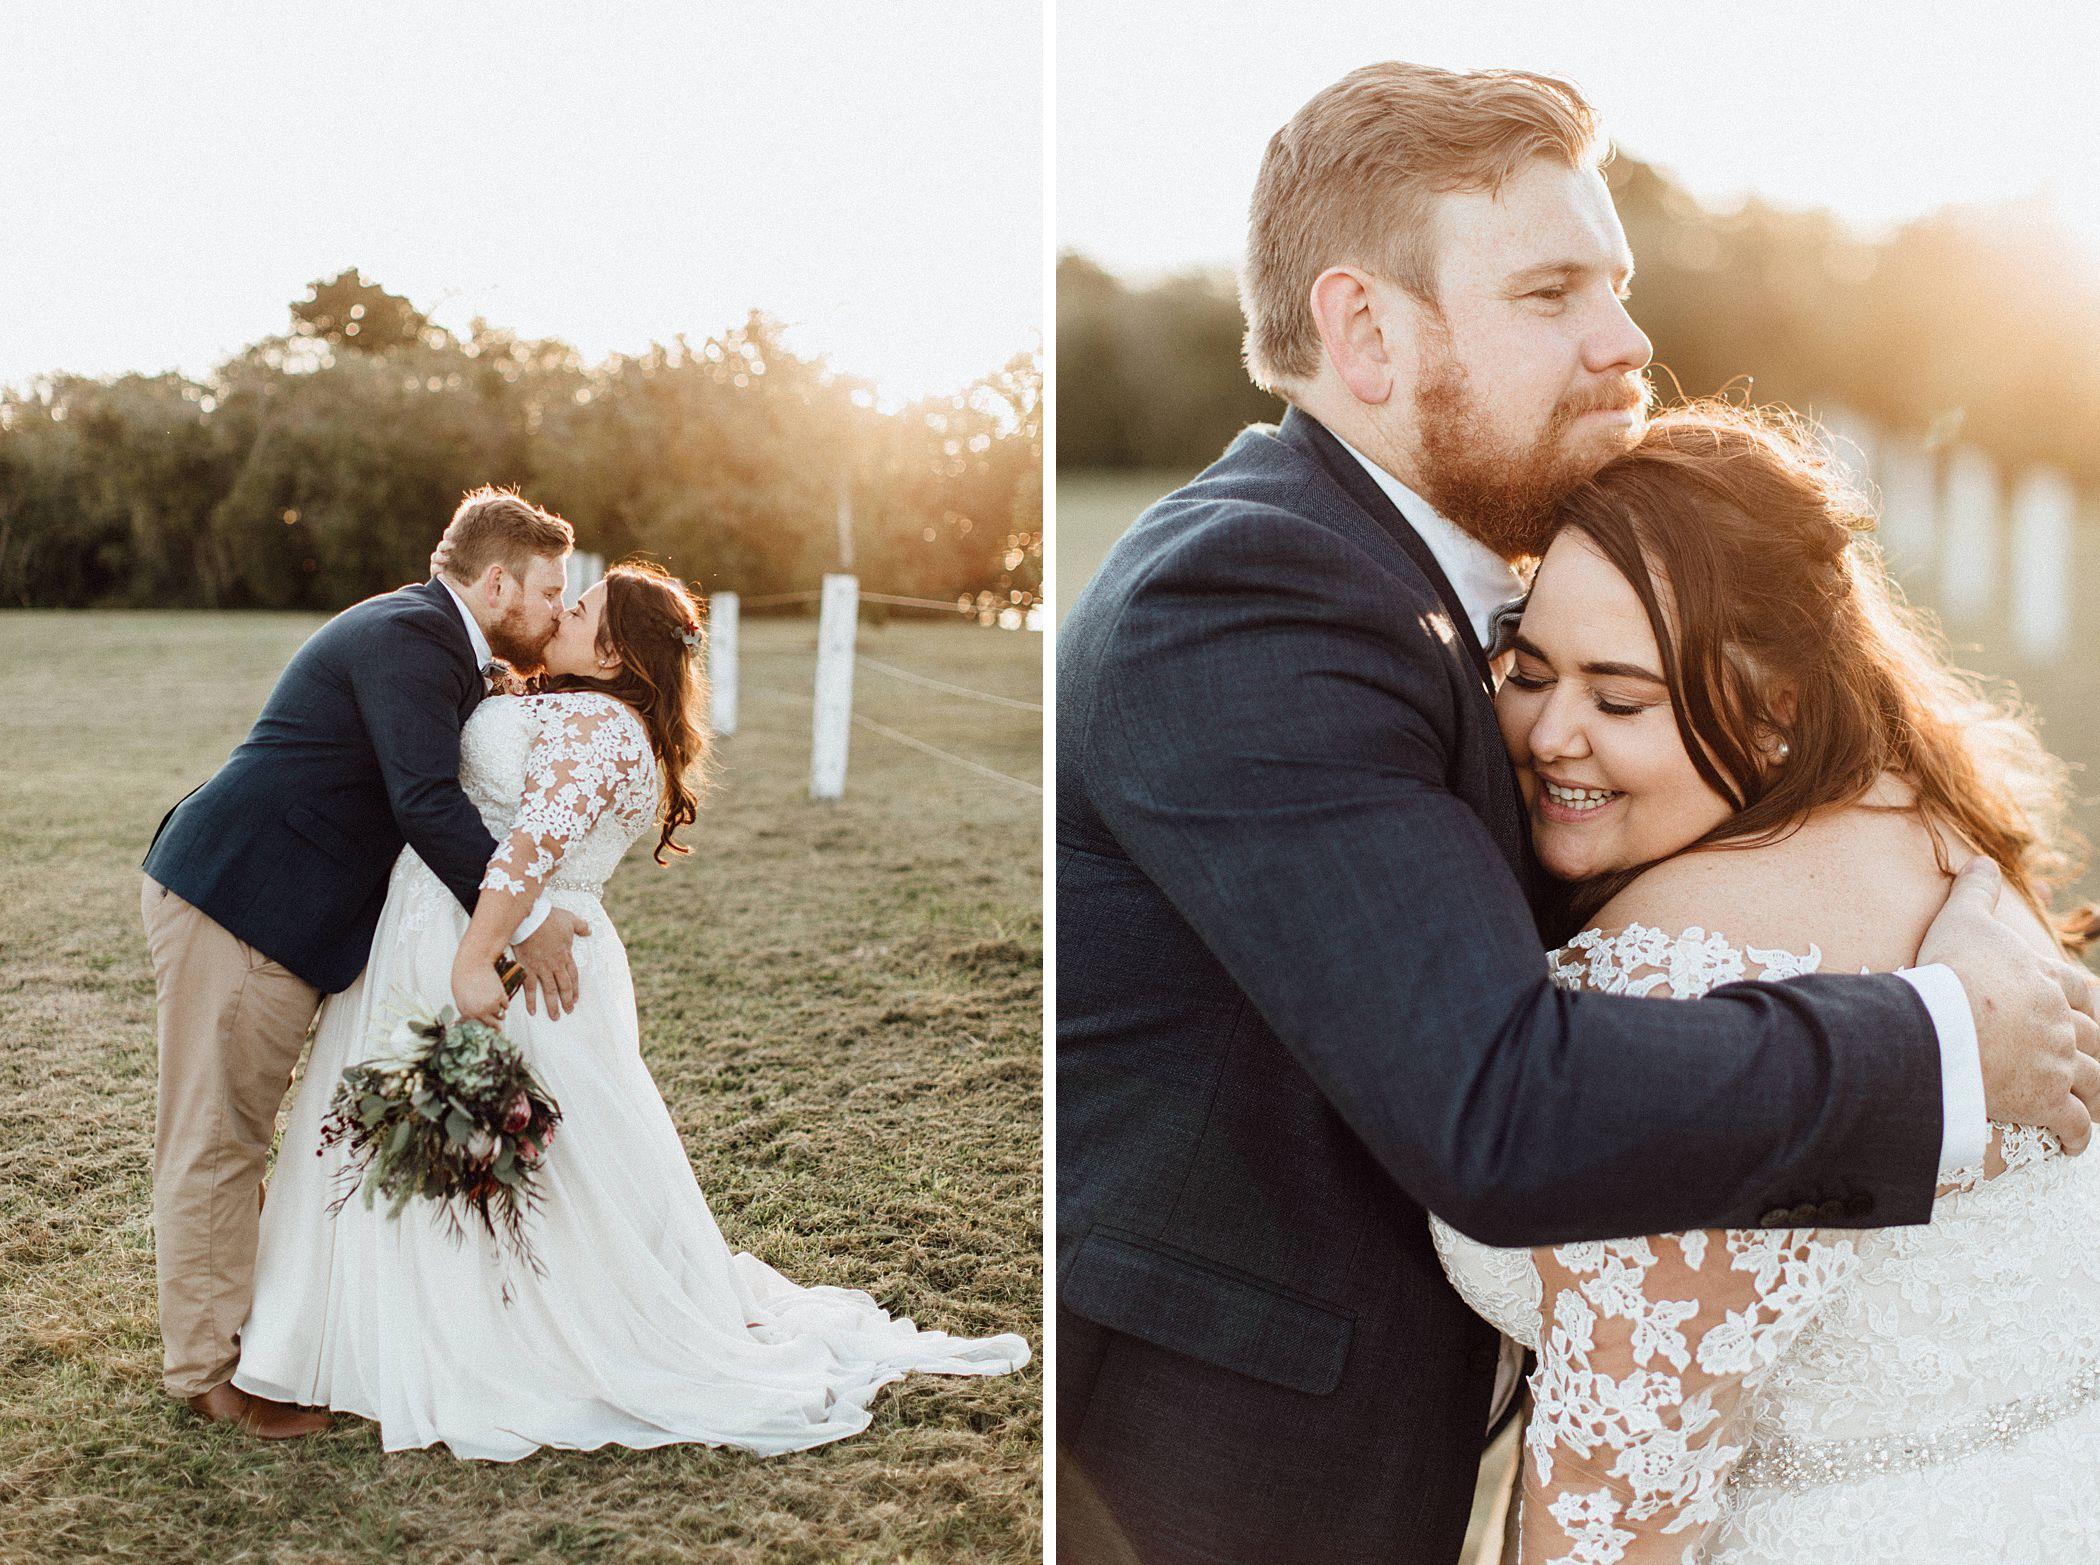 lauren-anne-photography-newcastle-hunter-valley-wedding-photographer_1210.jpg